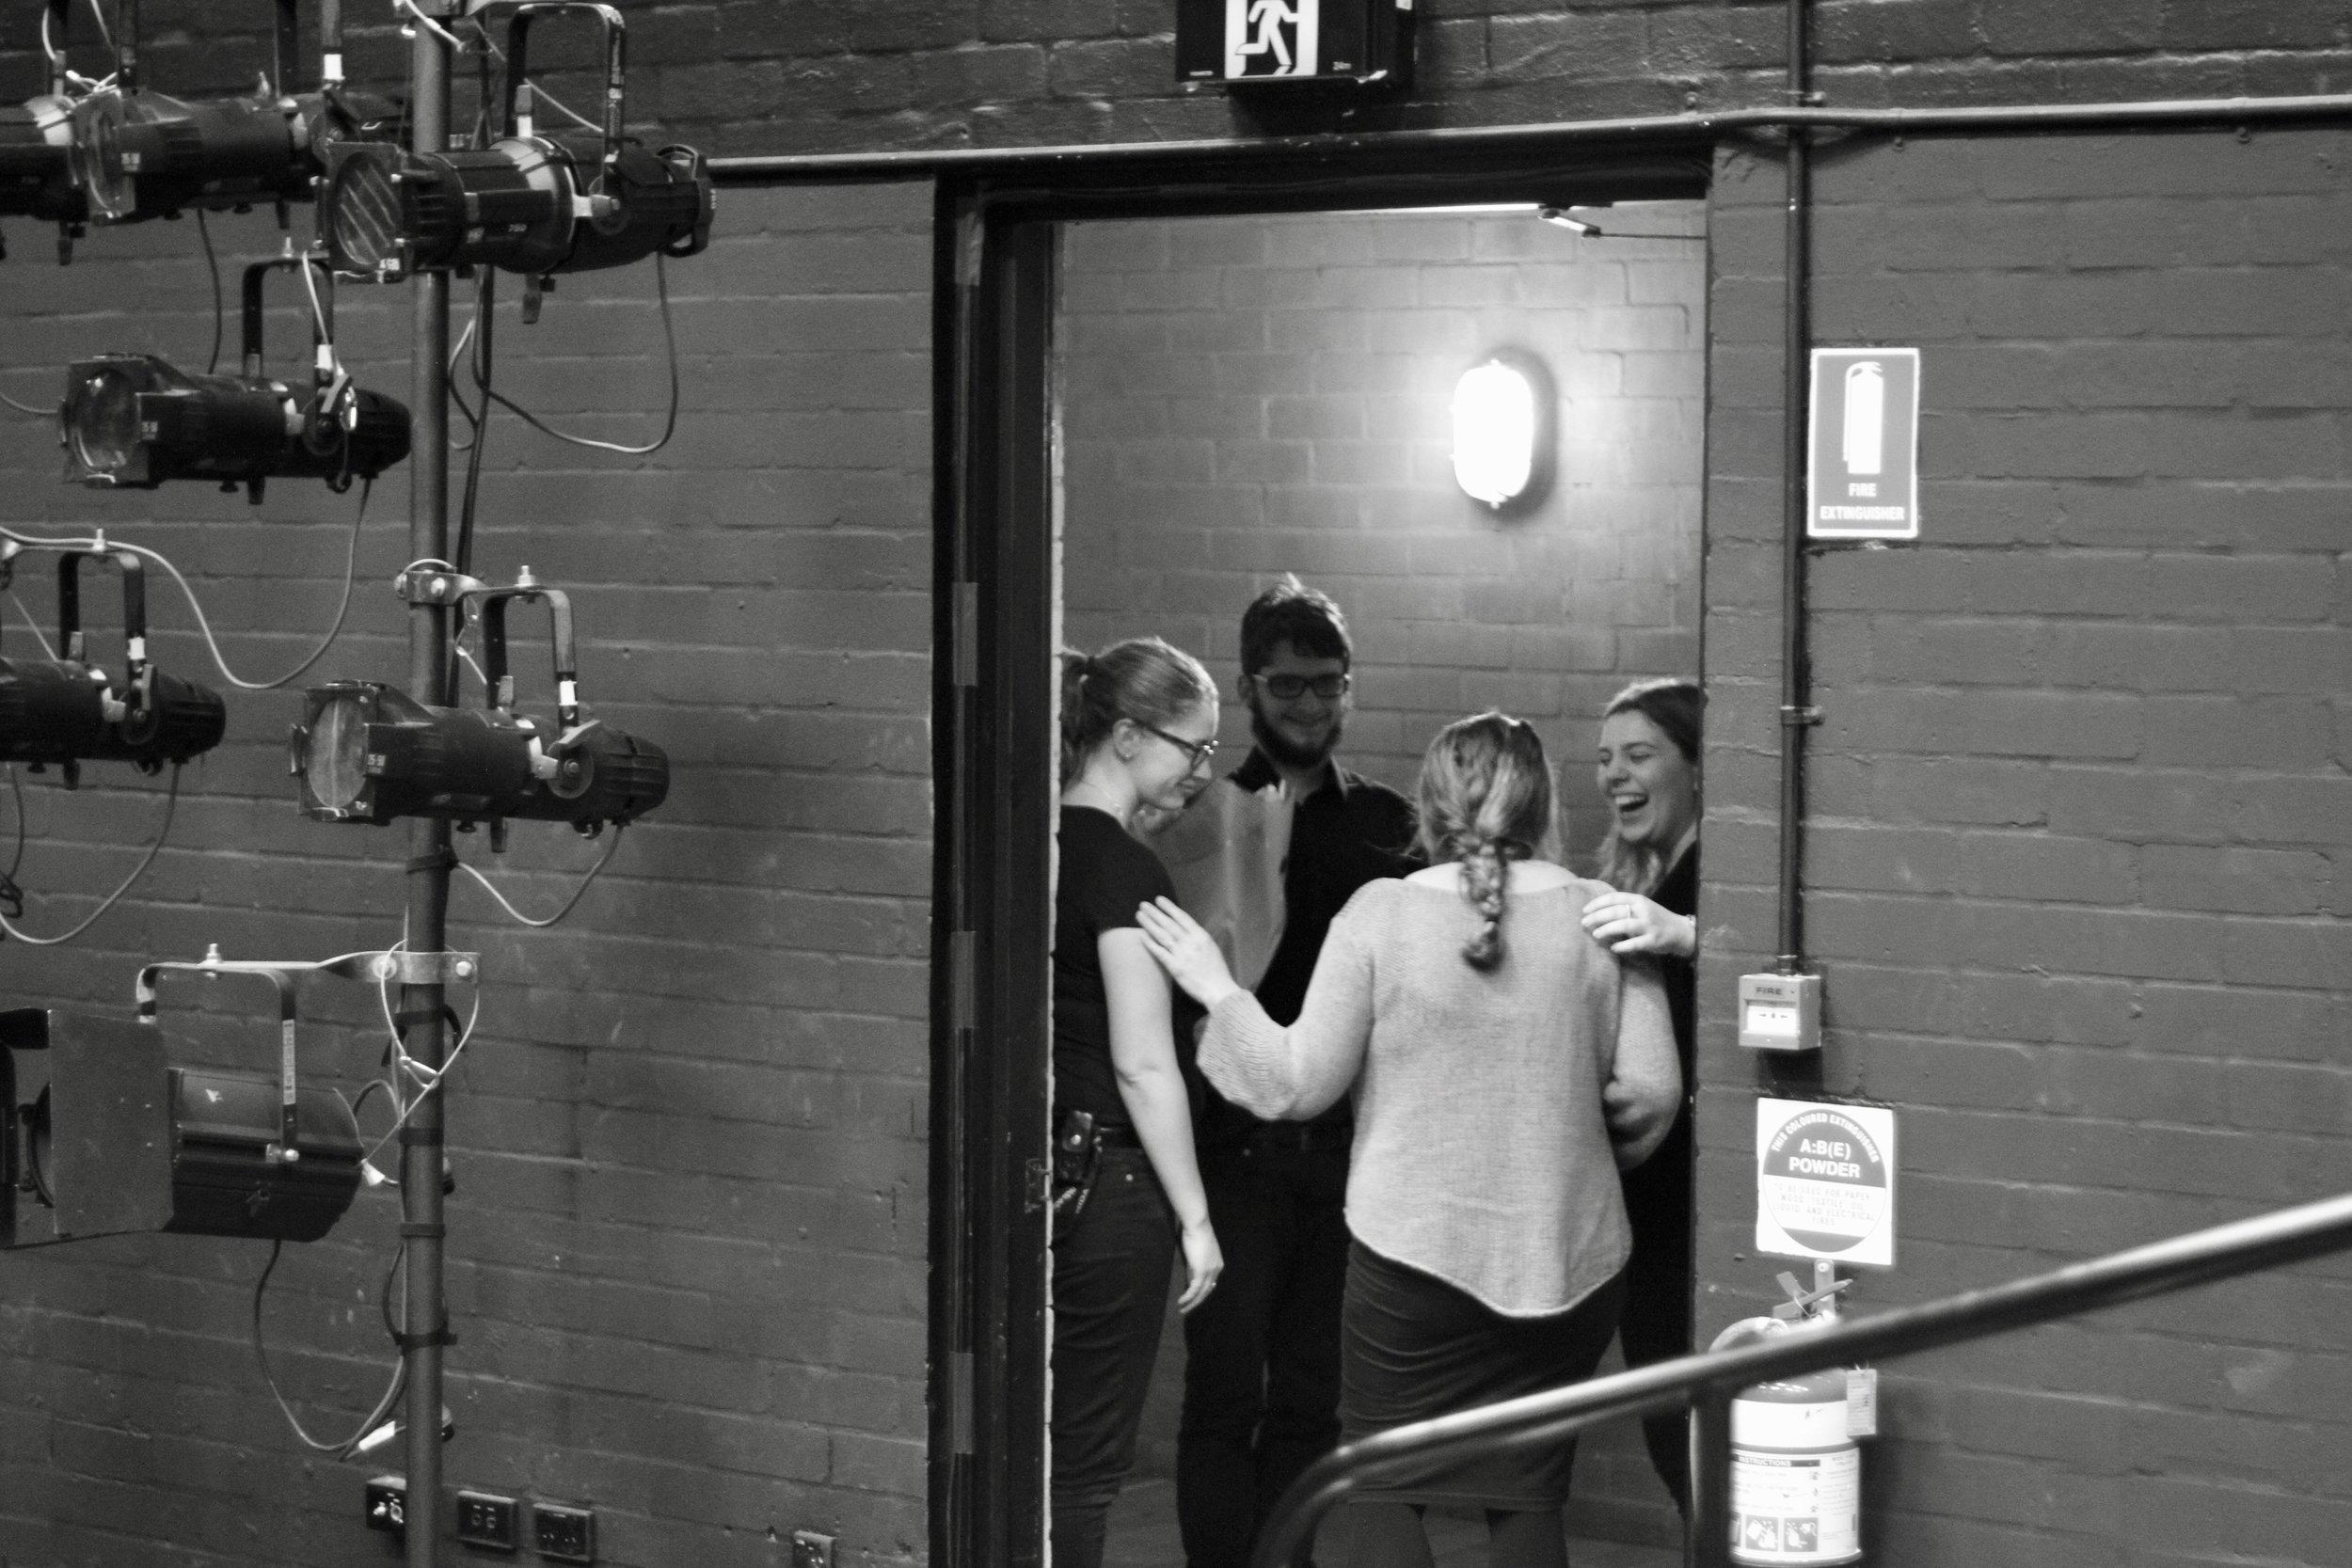 Stage Management - Love and Money, NIDA 2017 - photo by Anna McGrath